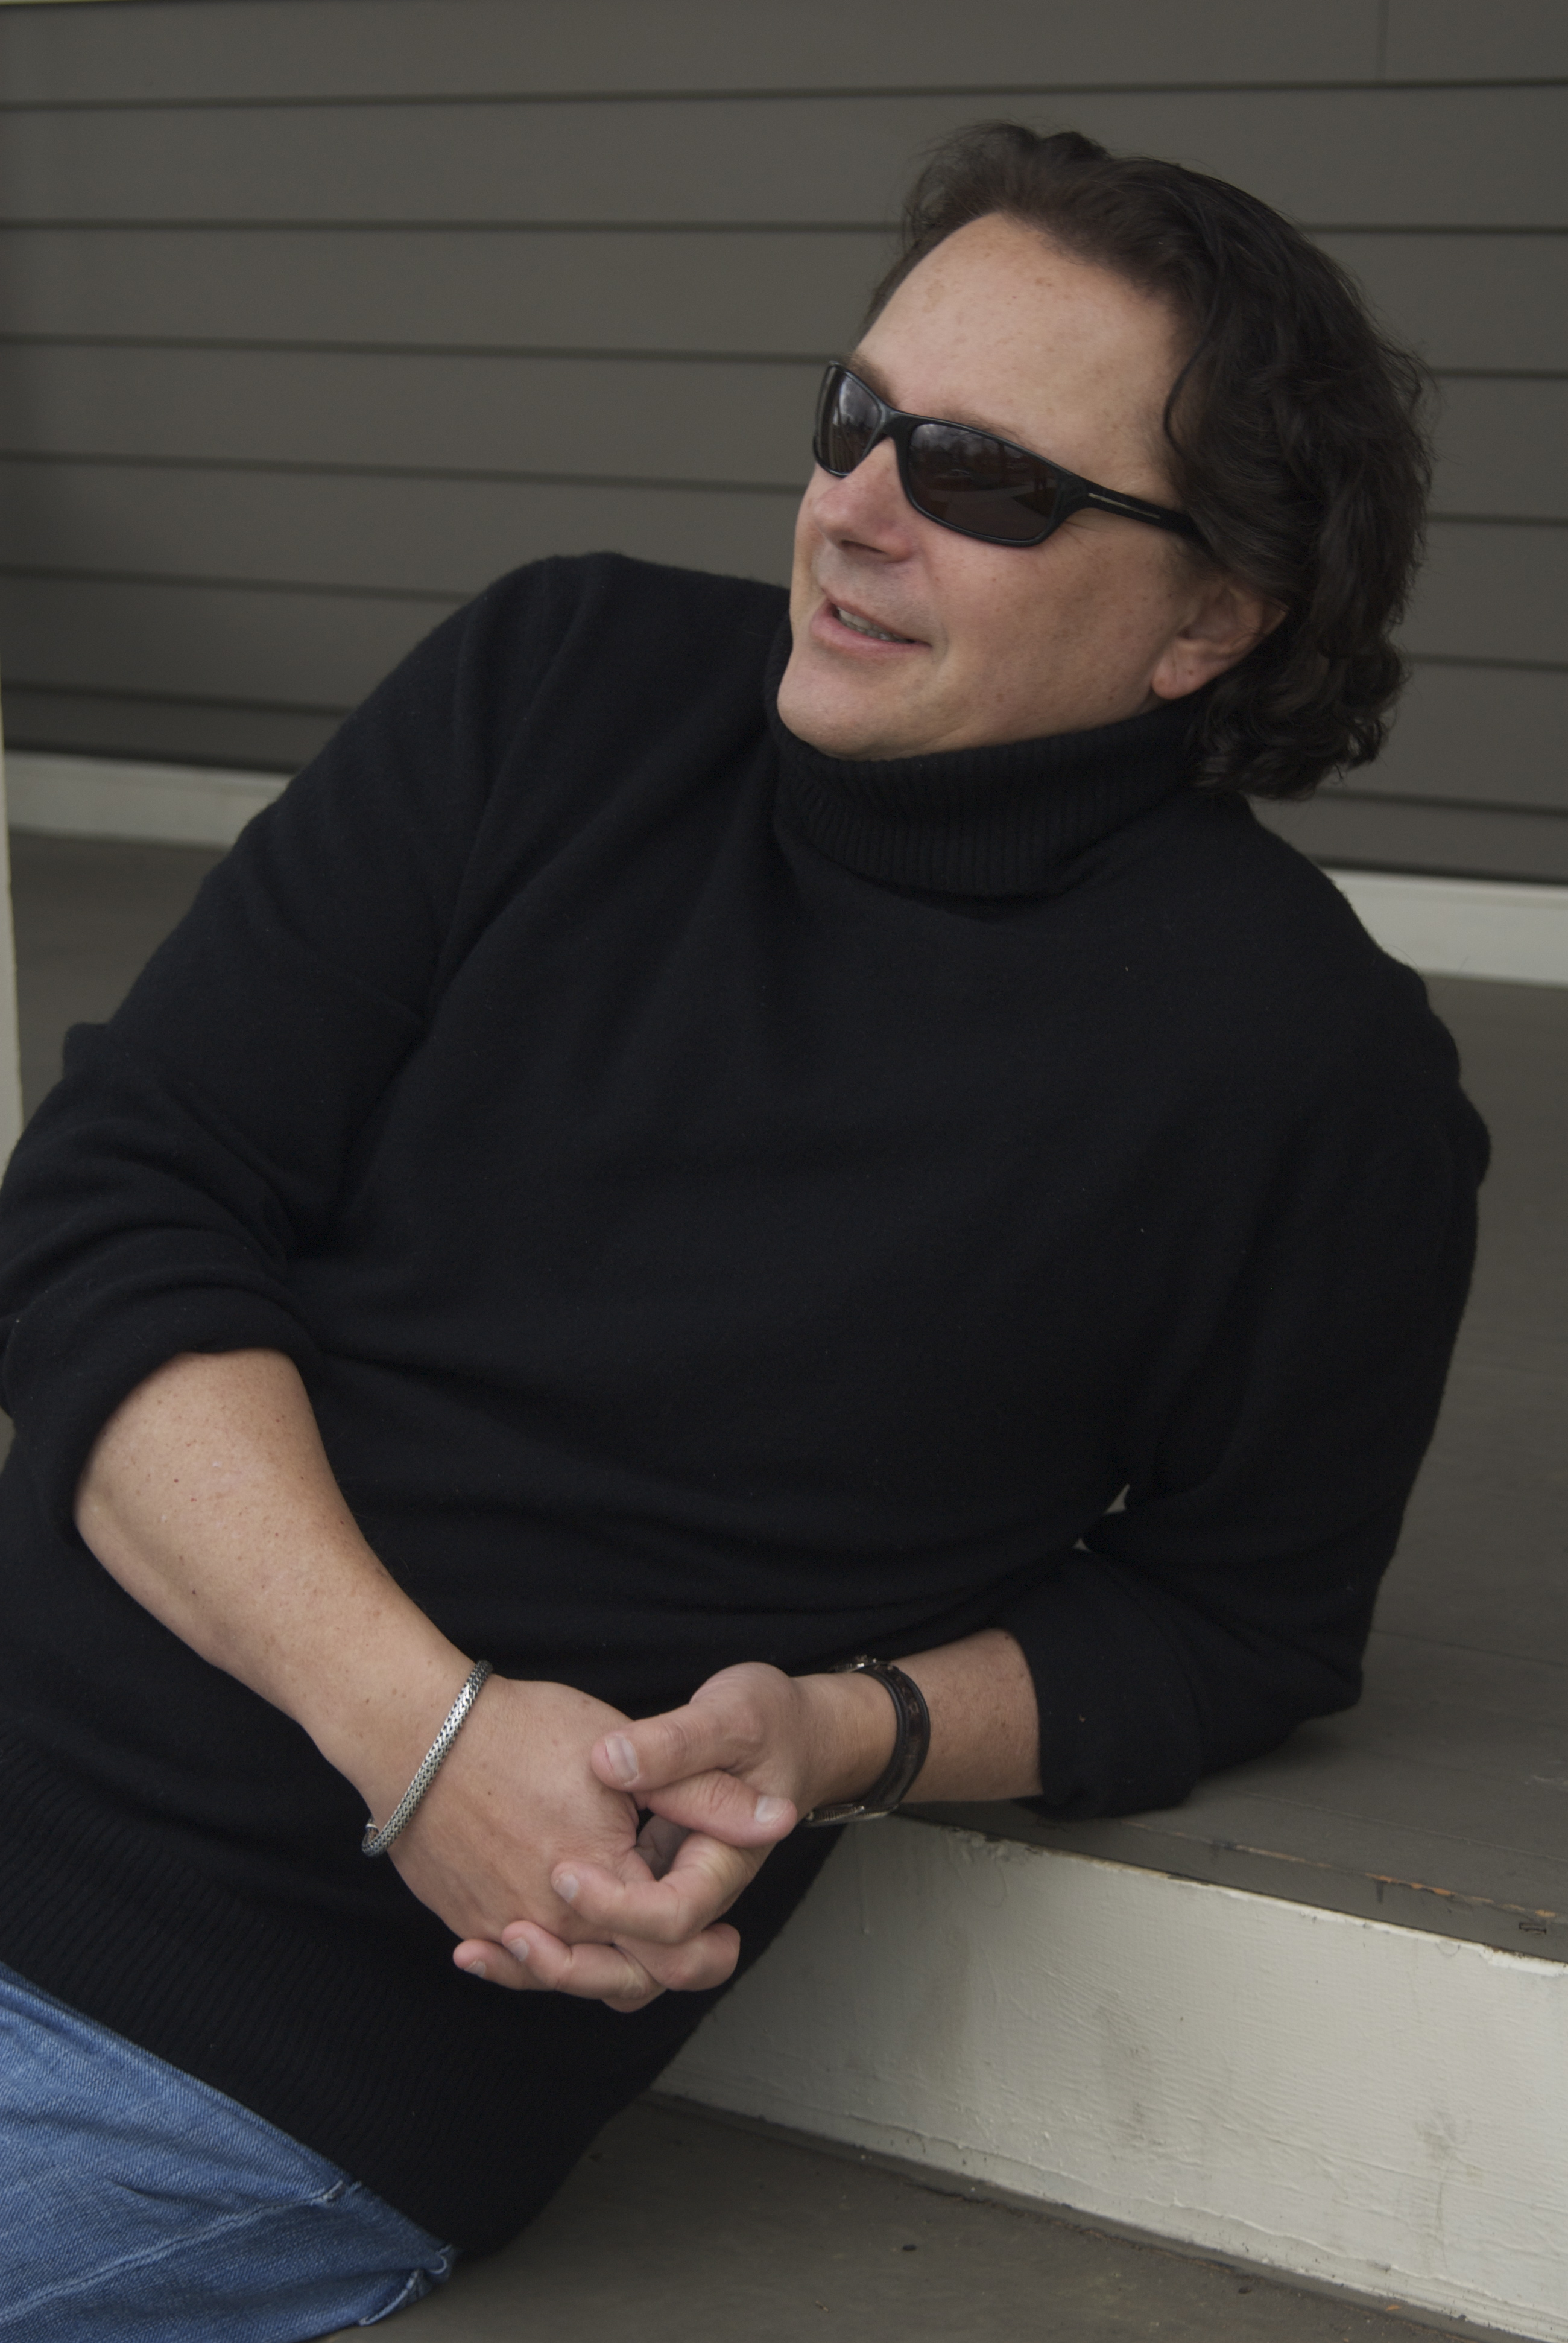 MAH On The Porch